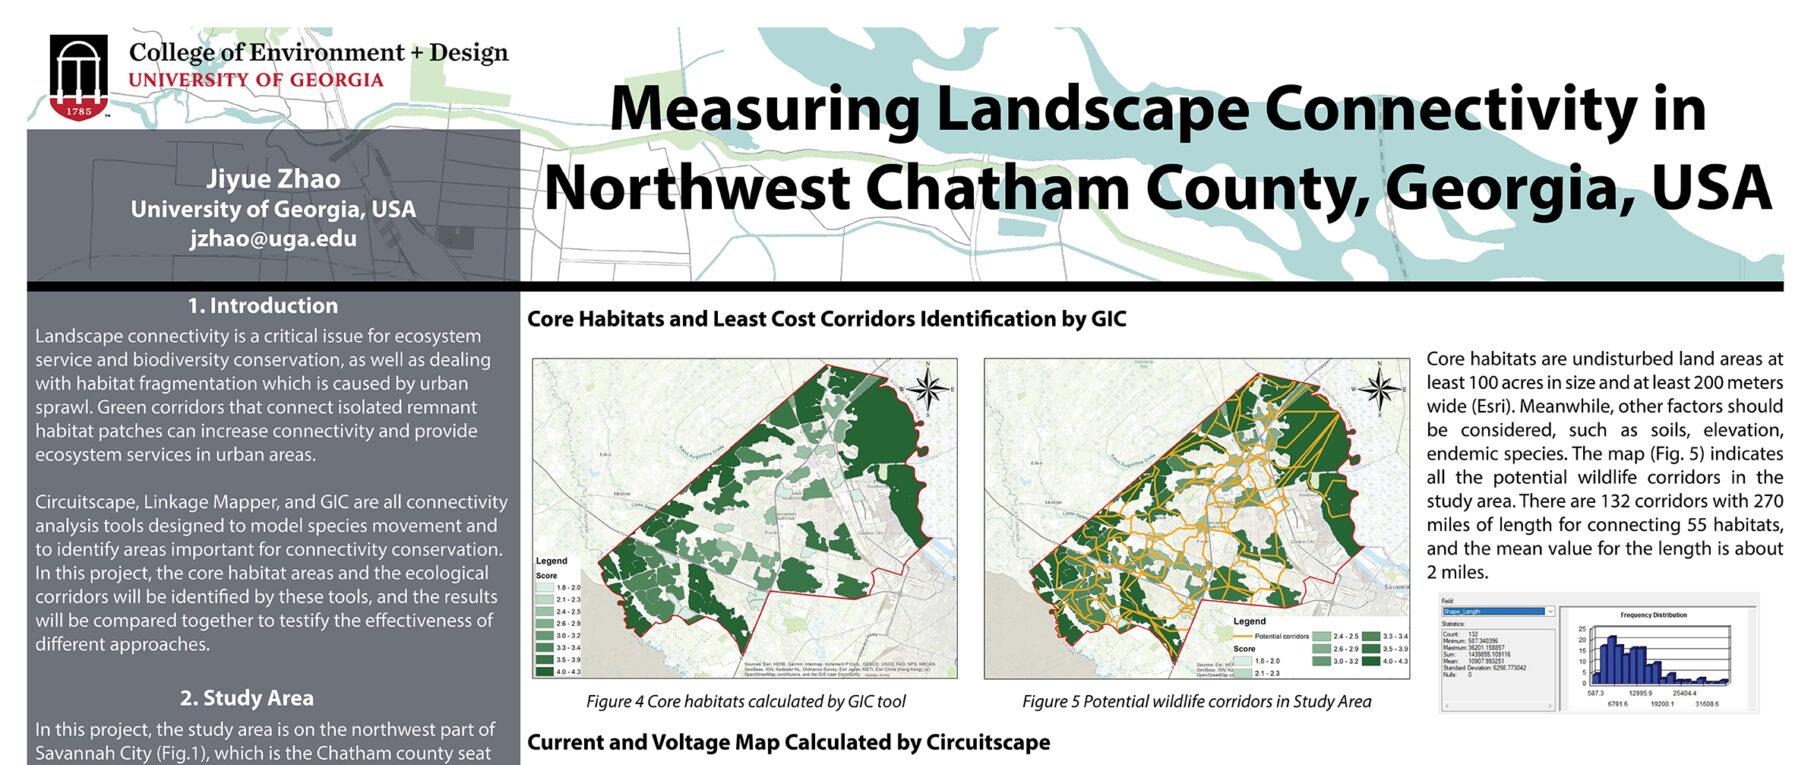 Digital Landscape Architecture Conference